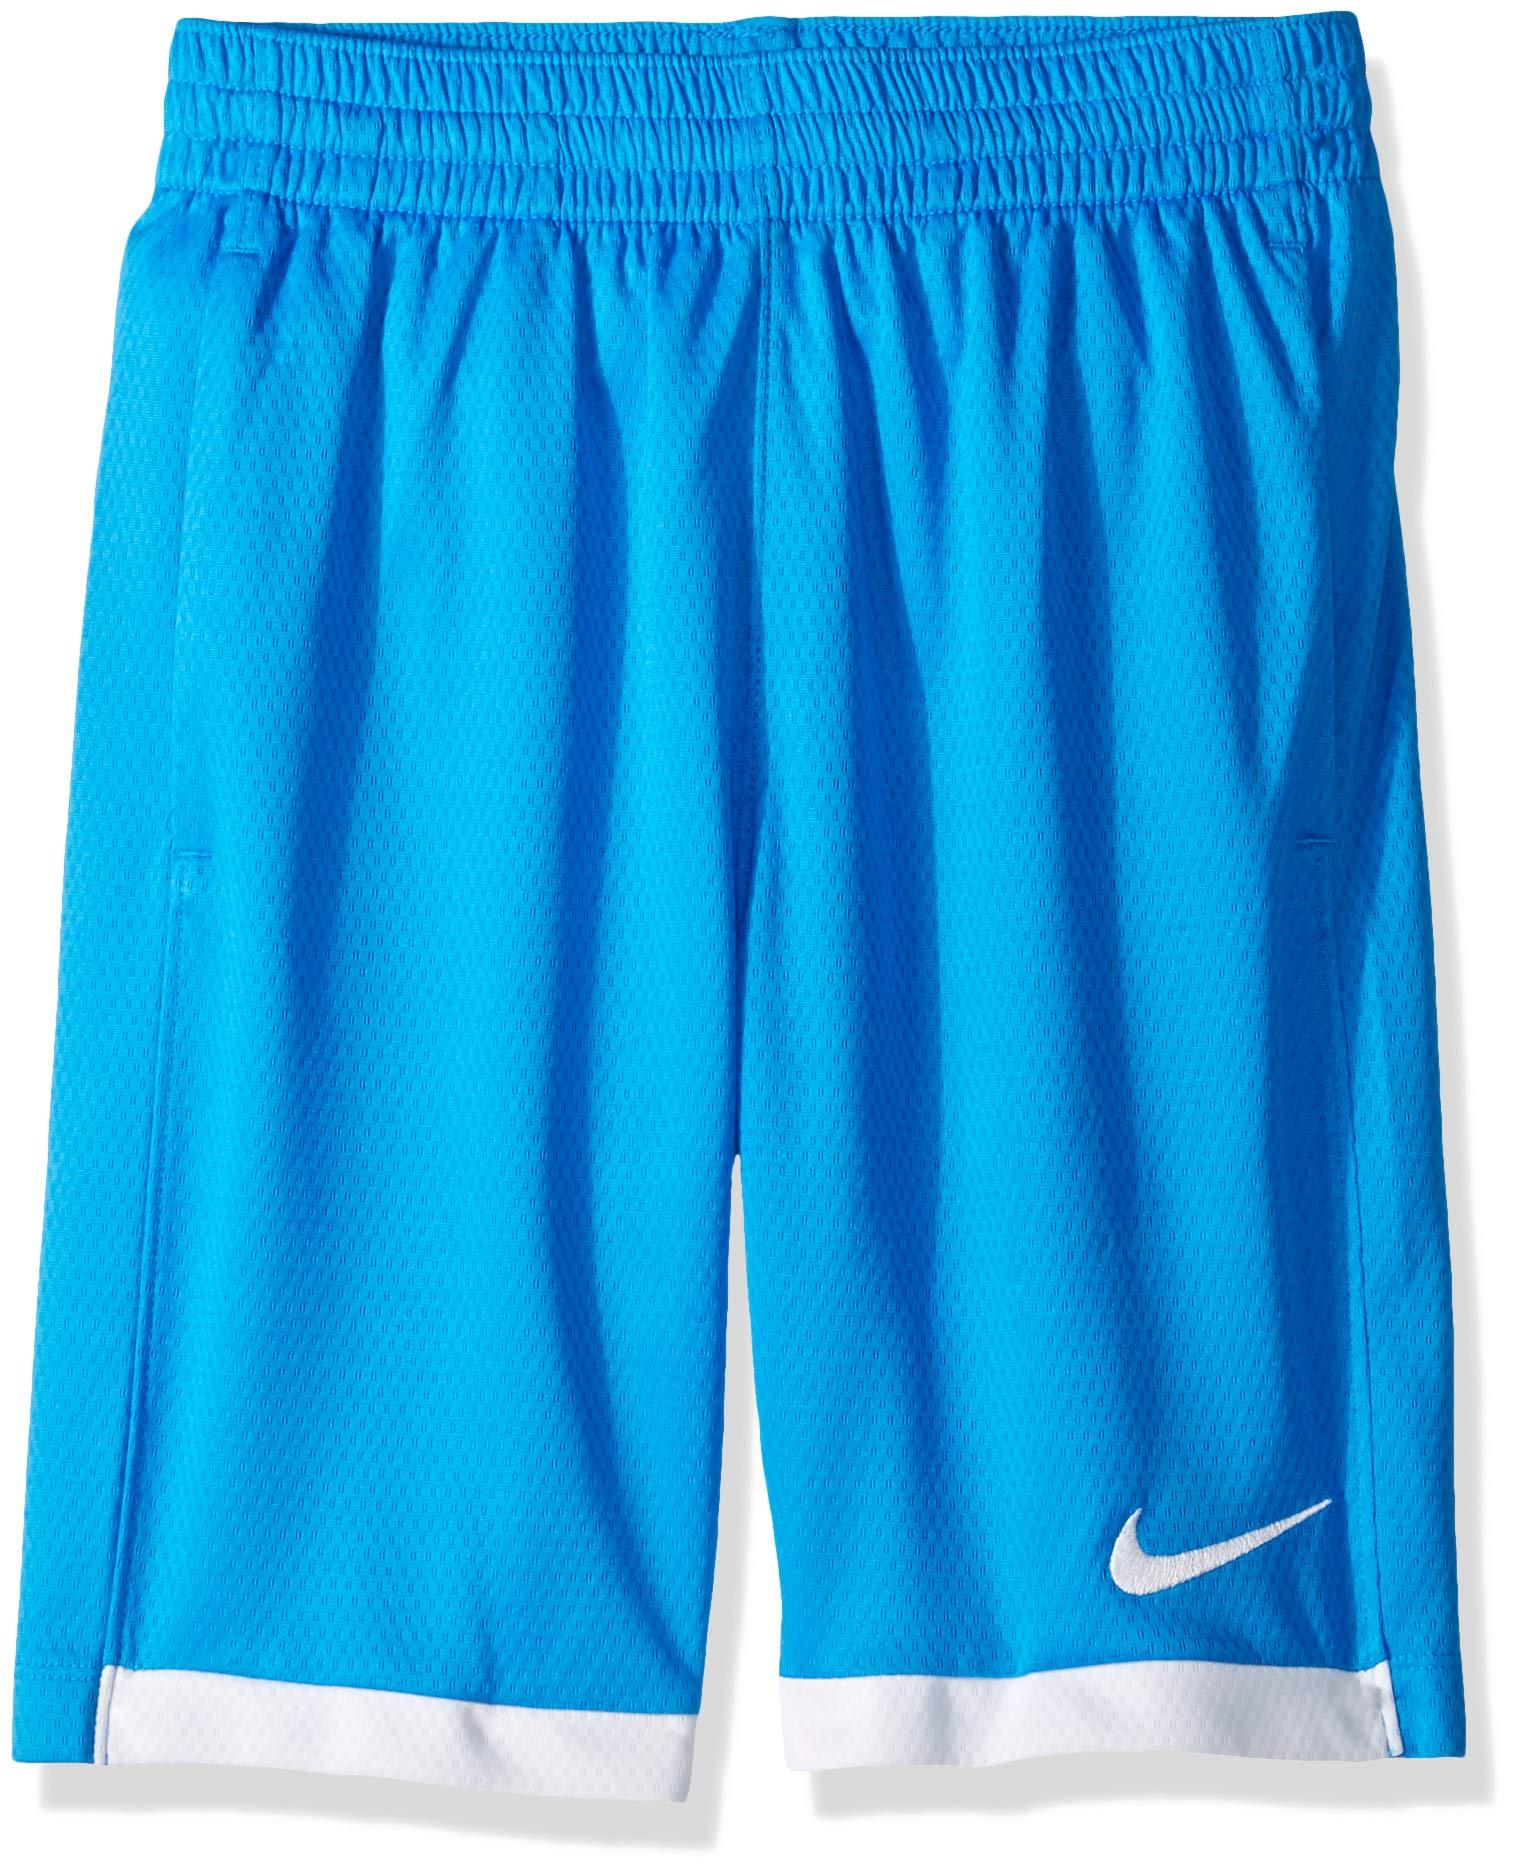 Nike Boy's Dry Short Trophy, Photo Blue/White/White, X-Small